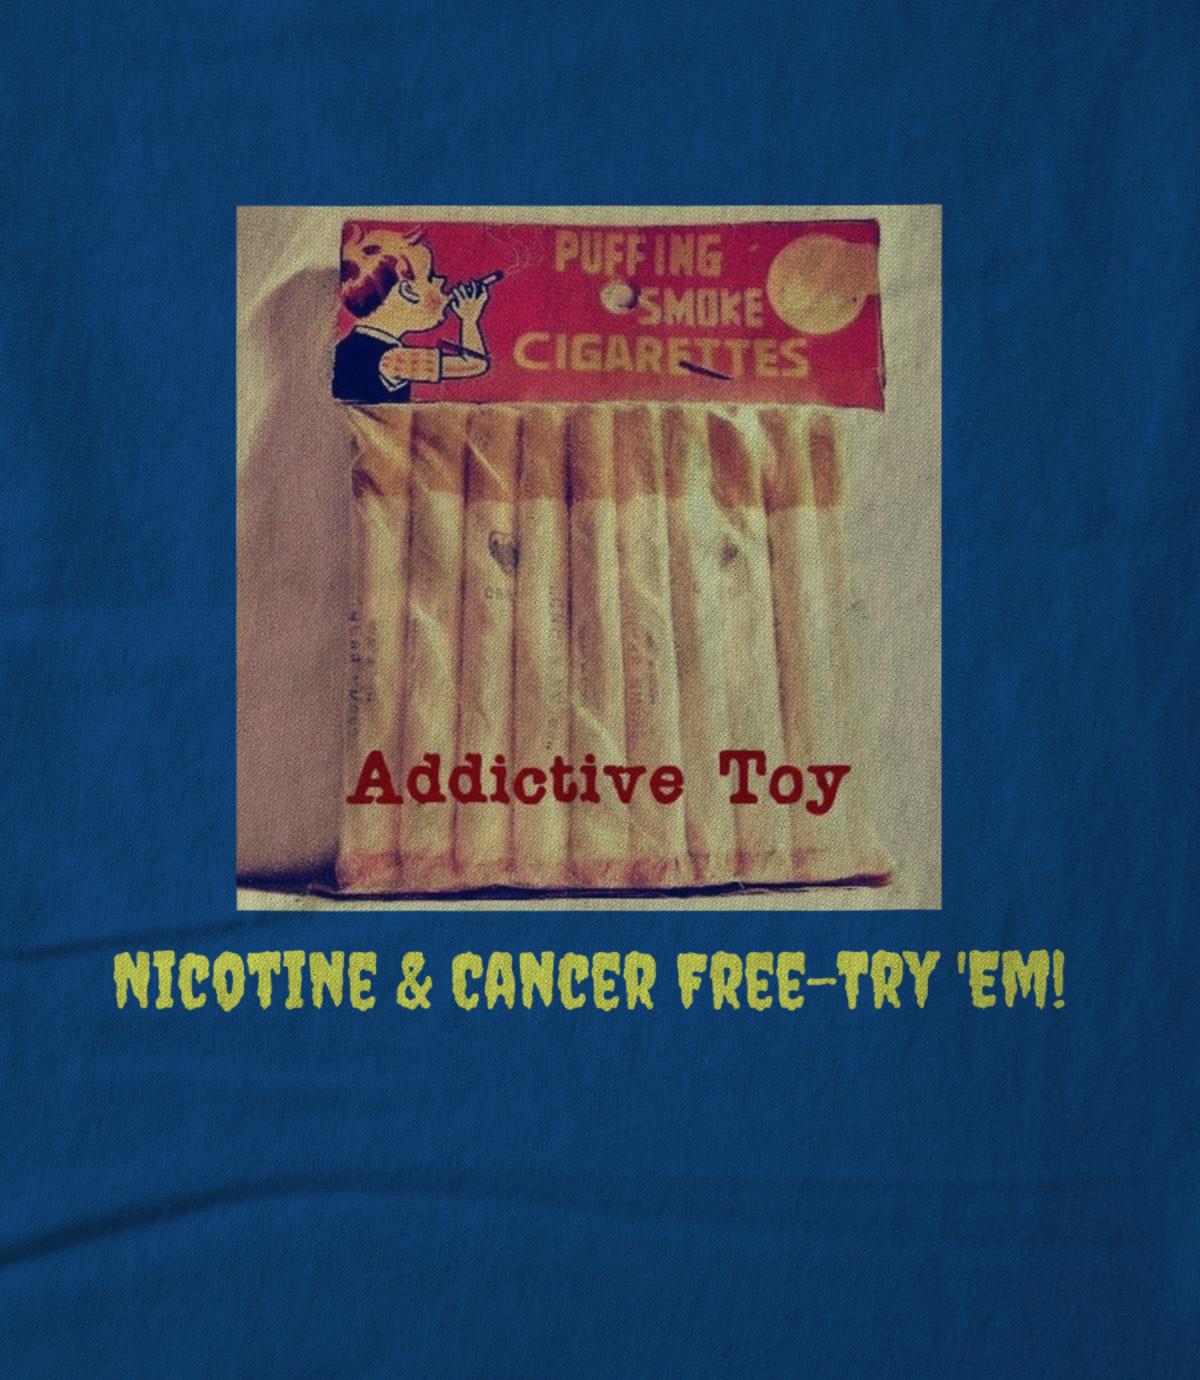 Art nicotine   cancer free try  em  1535486496